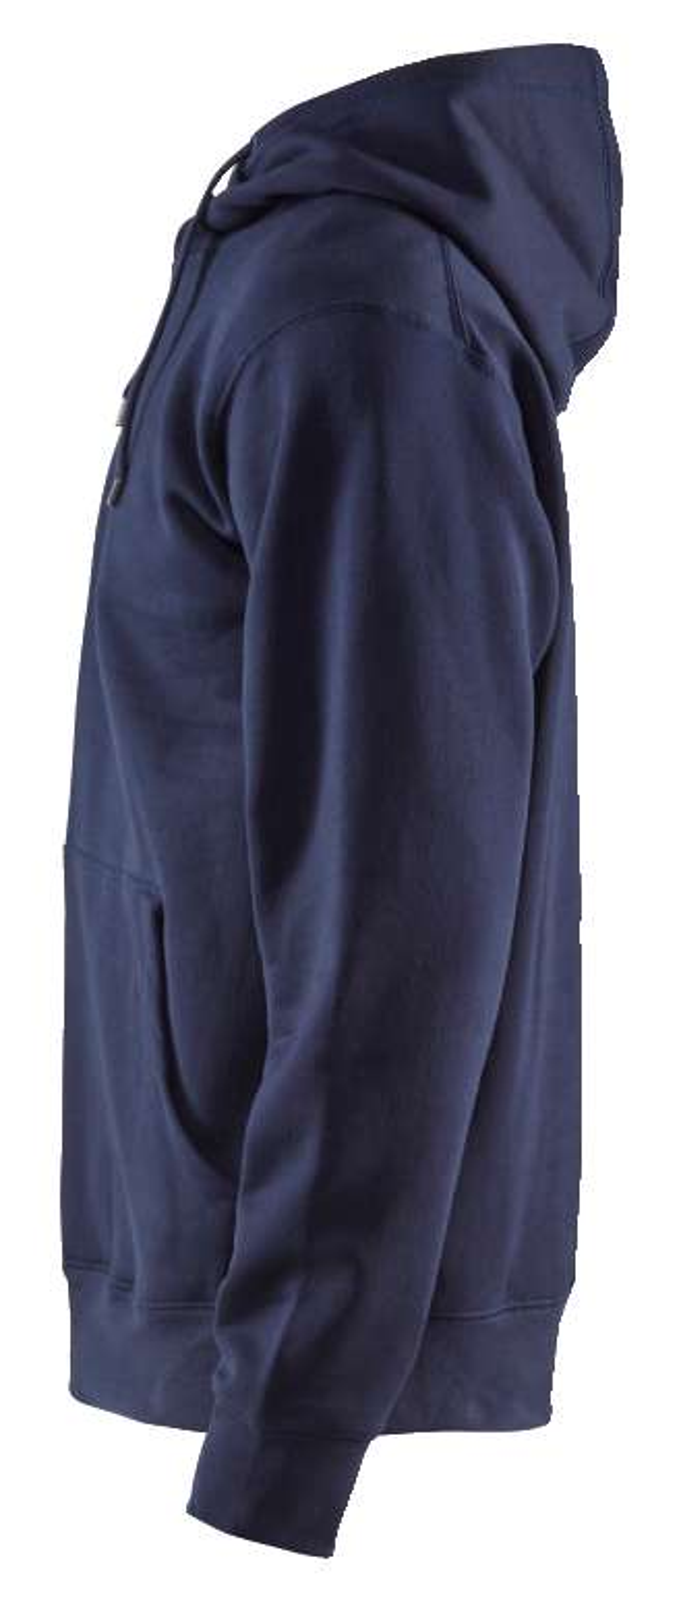 Blaklader Hooded sweatshirts 33961048 marineblauw(8800)